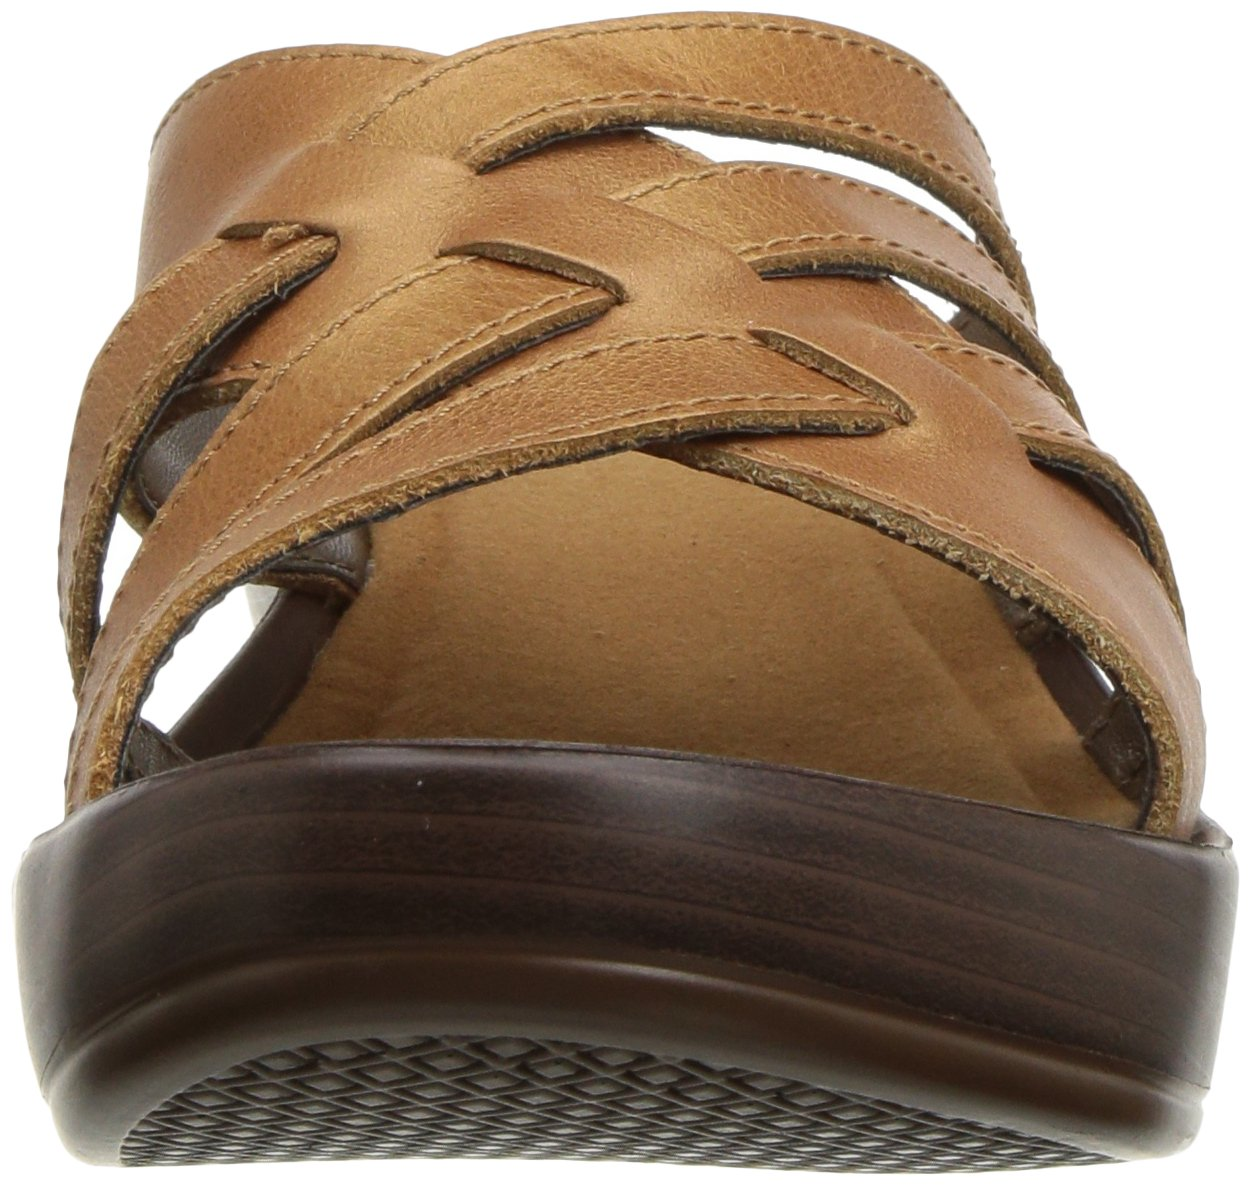 Eastland Women's Poppy Sandal B076QN9TGV 7 W US|Tan